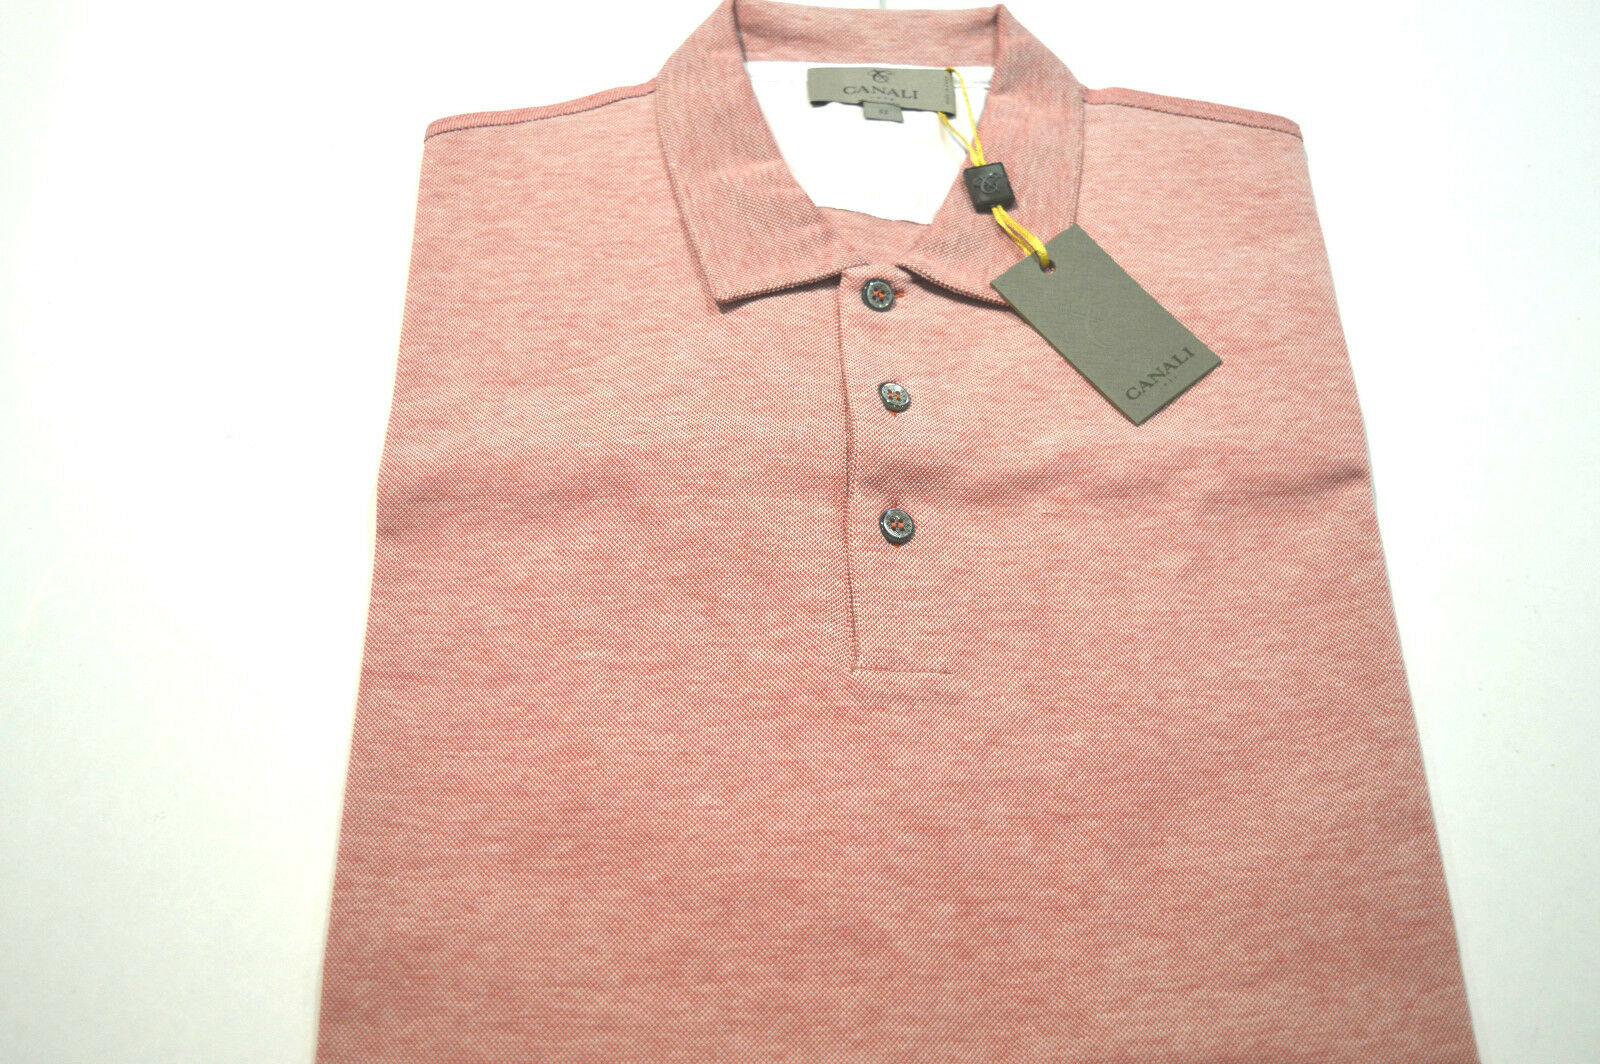 NEW  CANALI Polo  Short Sleeve 100% Cotton Größe XL Us Eu 54 Made in